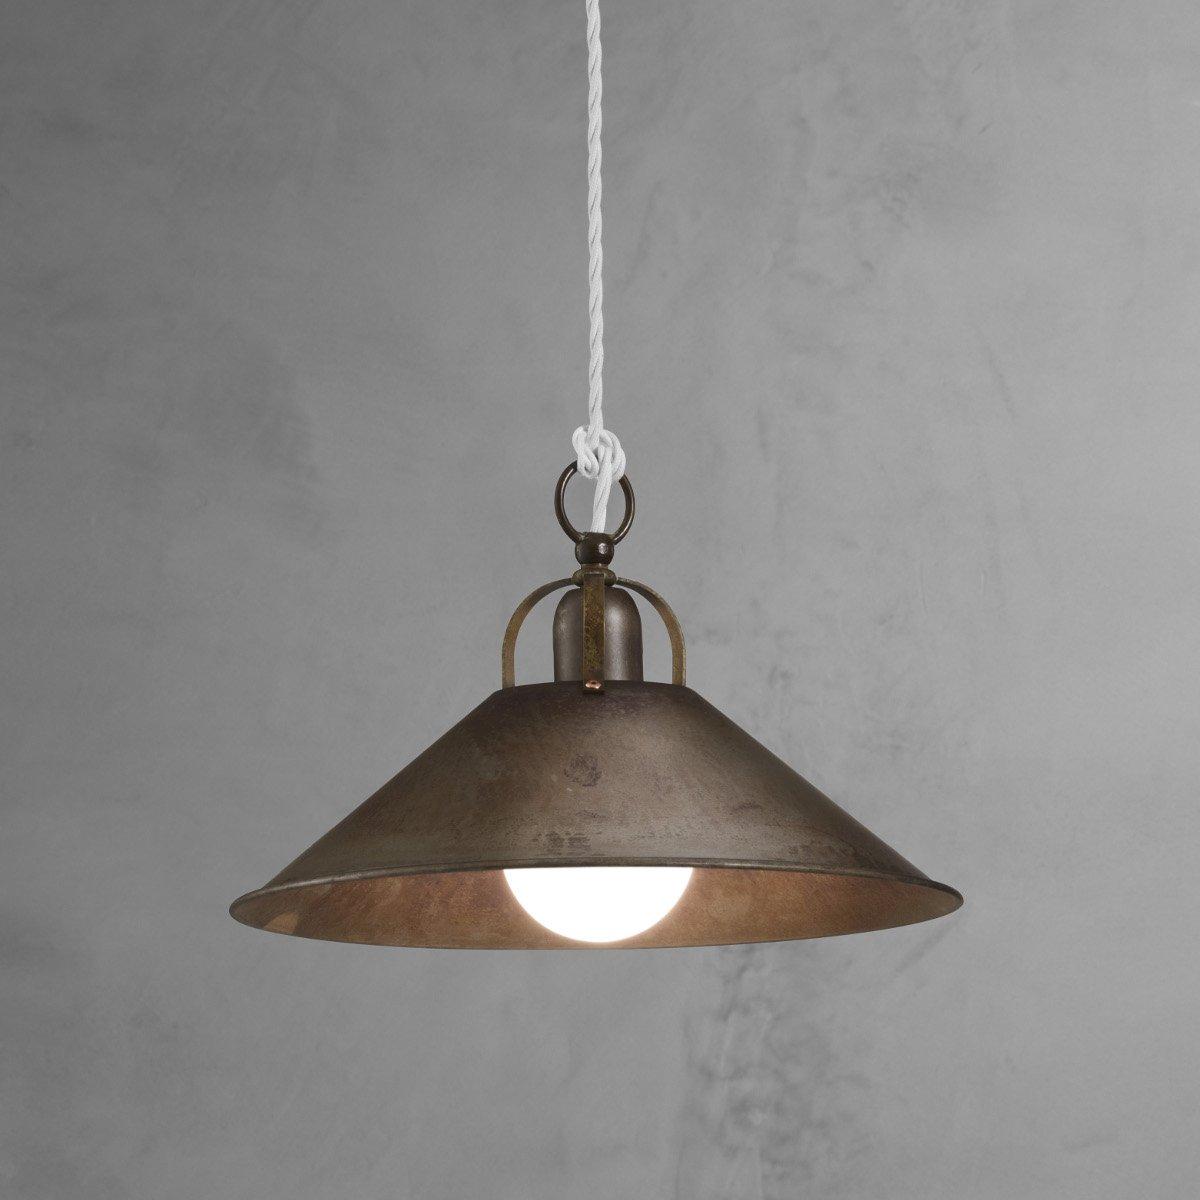 metall h ngelampe la cascina von il fanale bei lampen suntinger shop kaufen. Black Bedroom Furniture Sets. Home Design Ideas